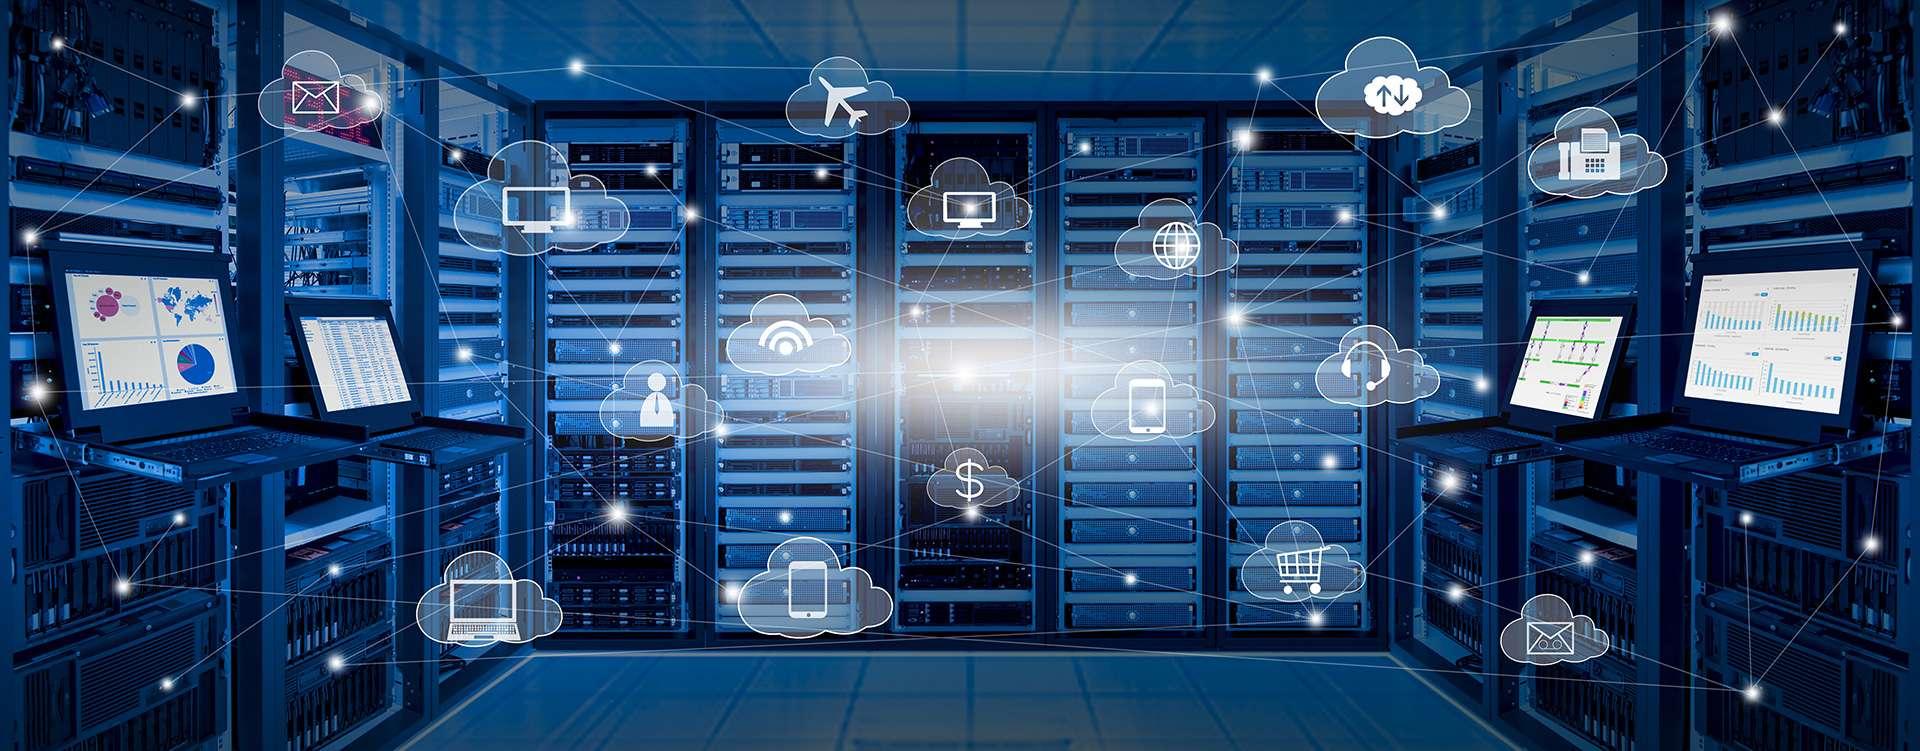 Cloud Computing sinnvoll nutzen